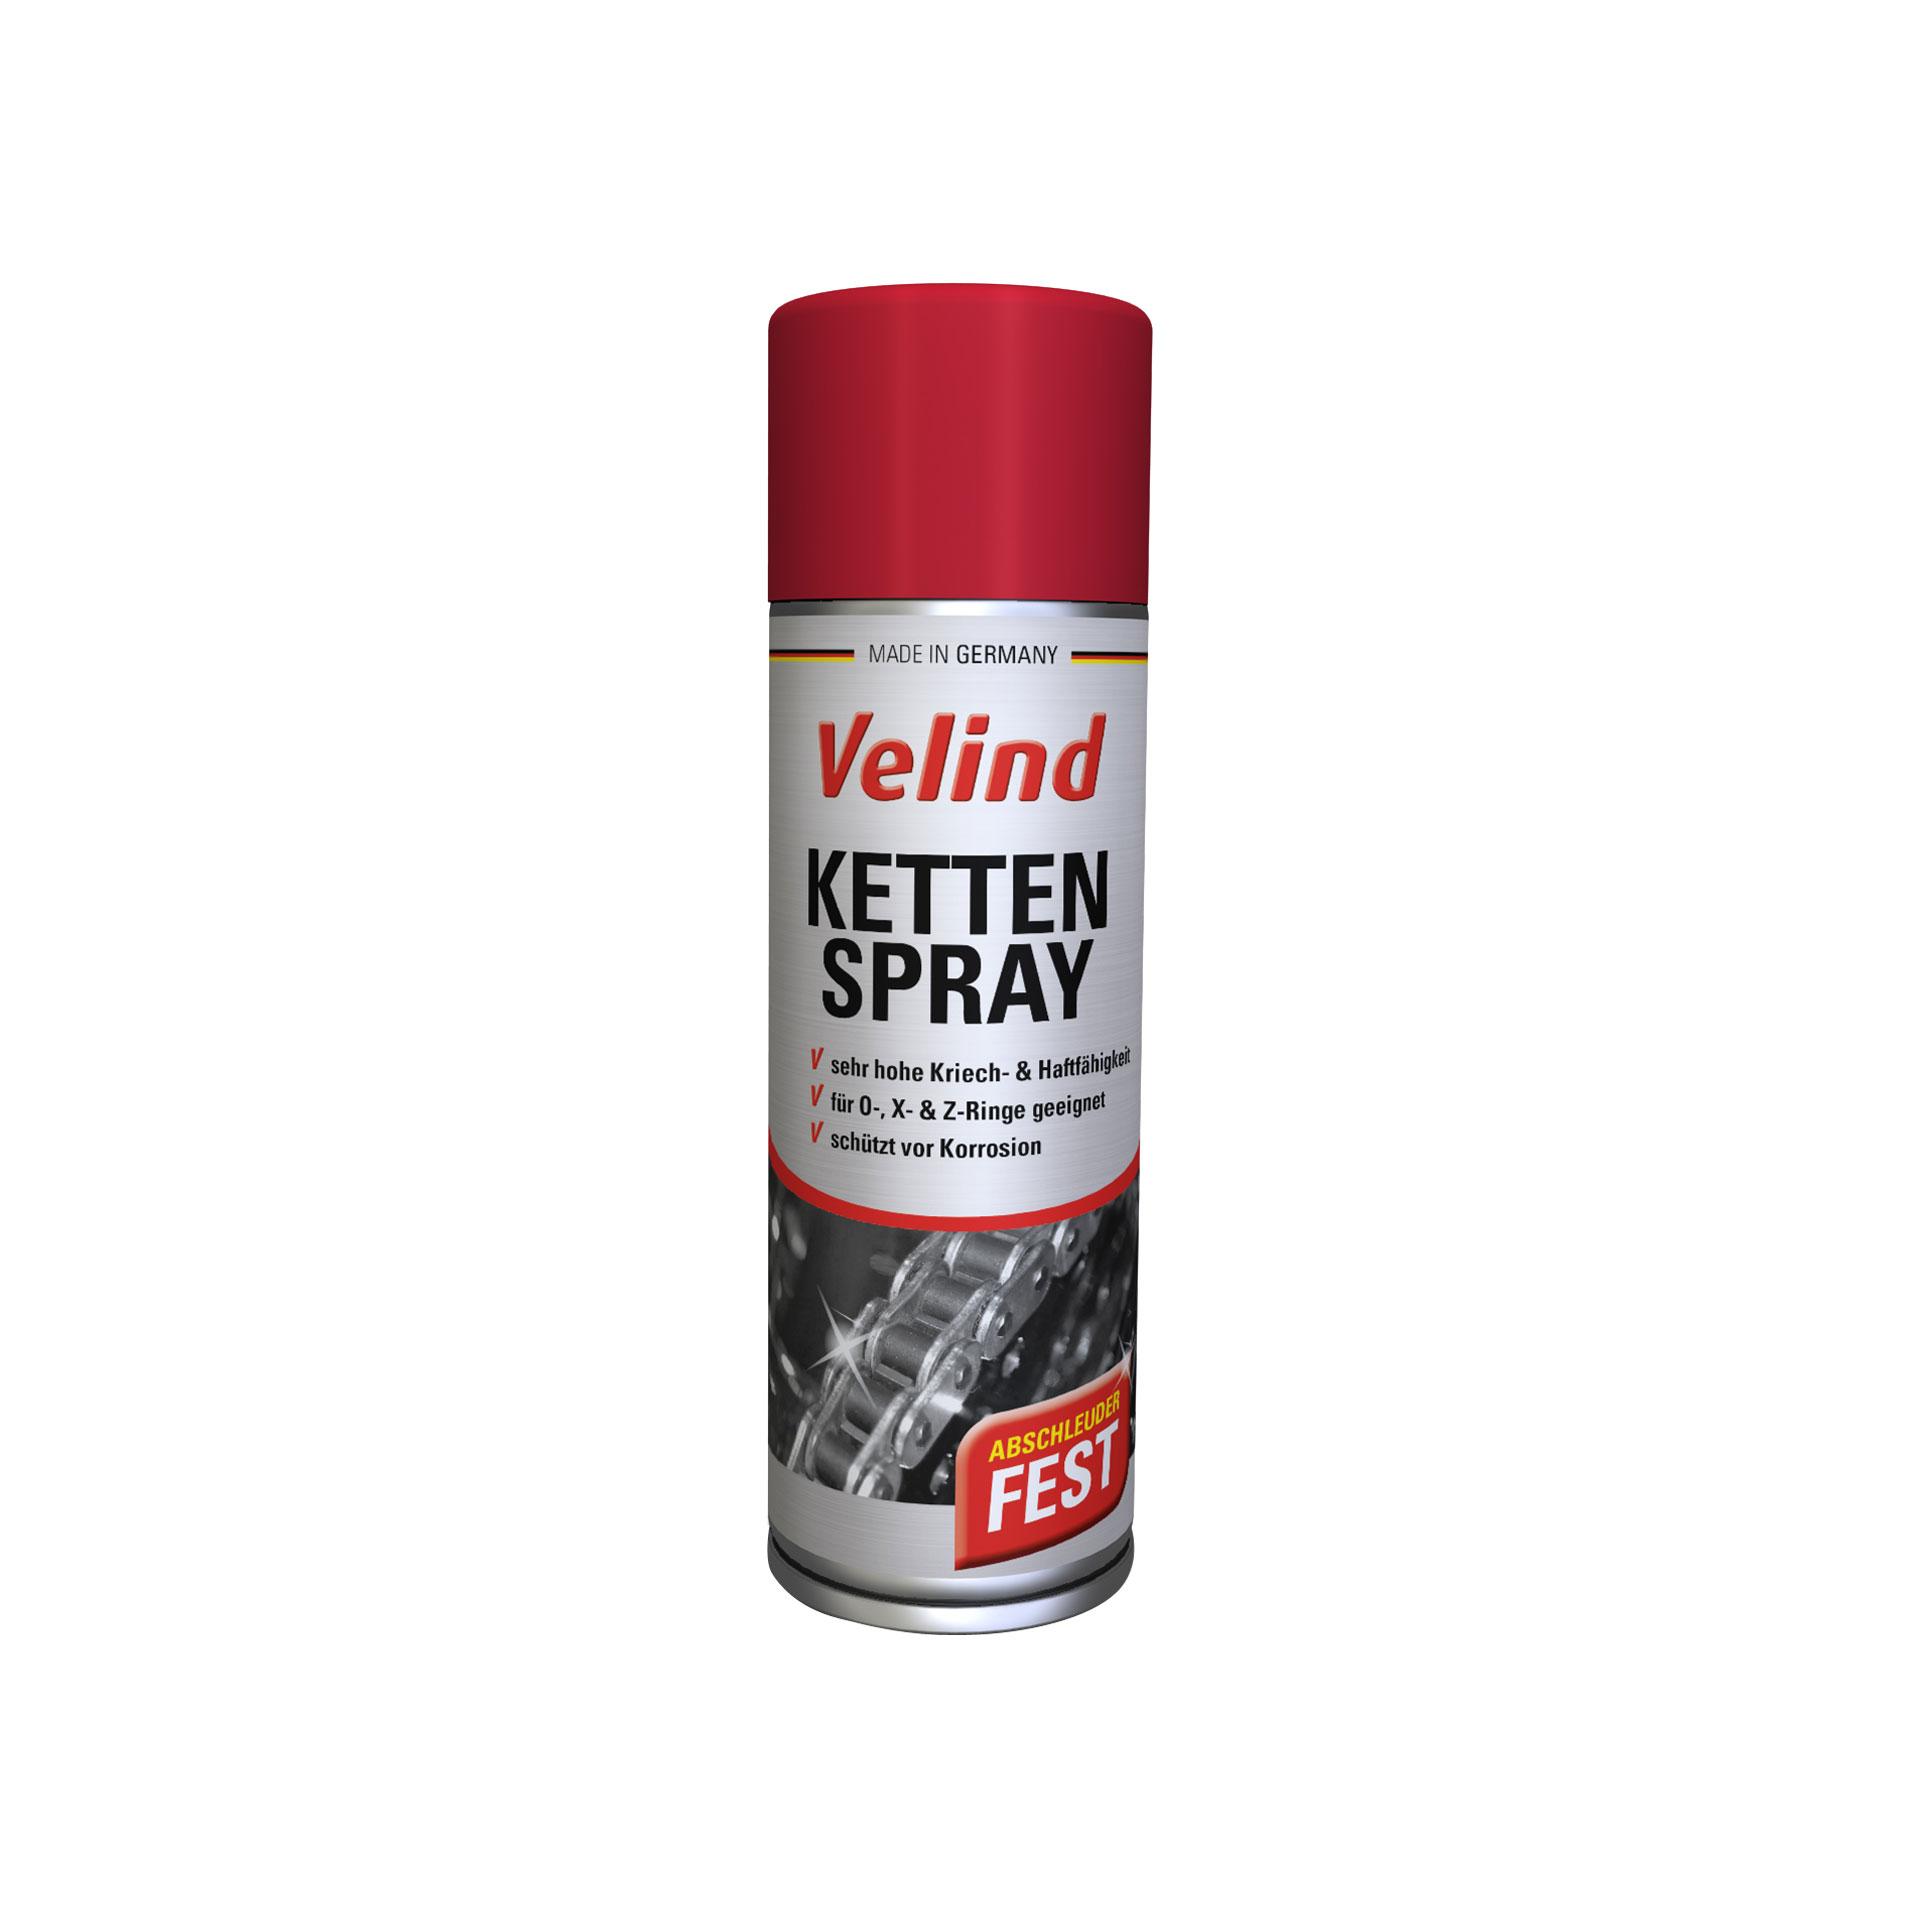 Kettenspray, 300 ml